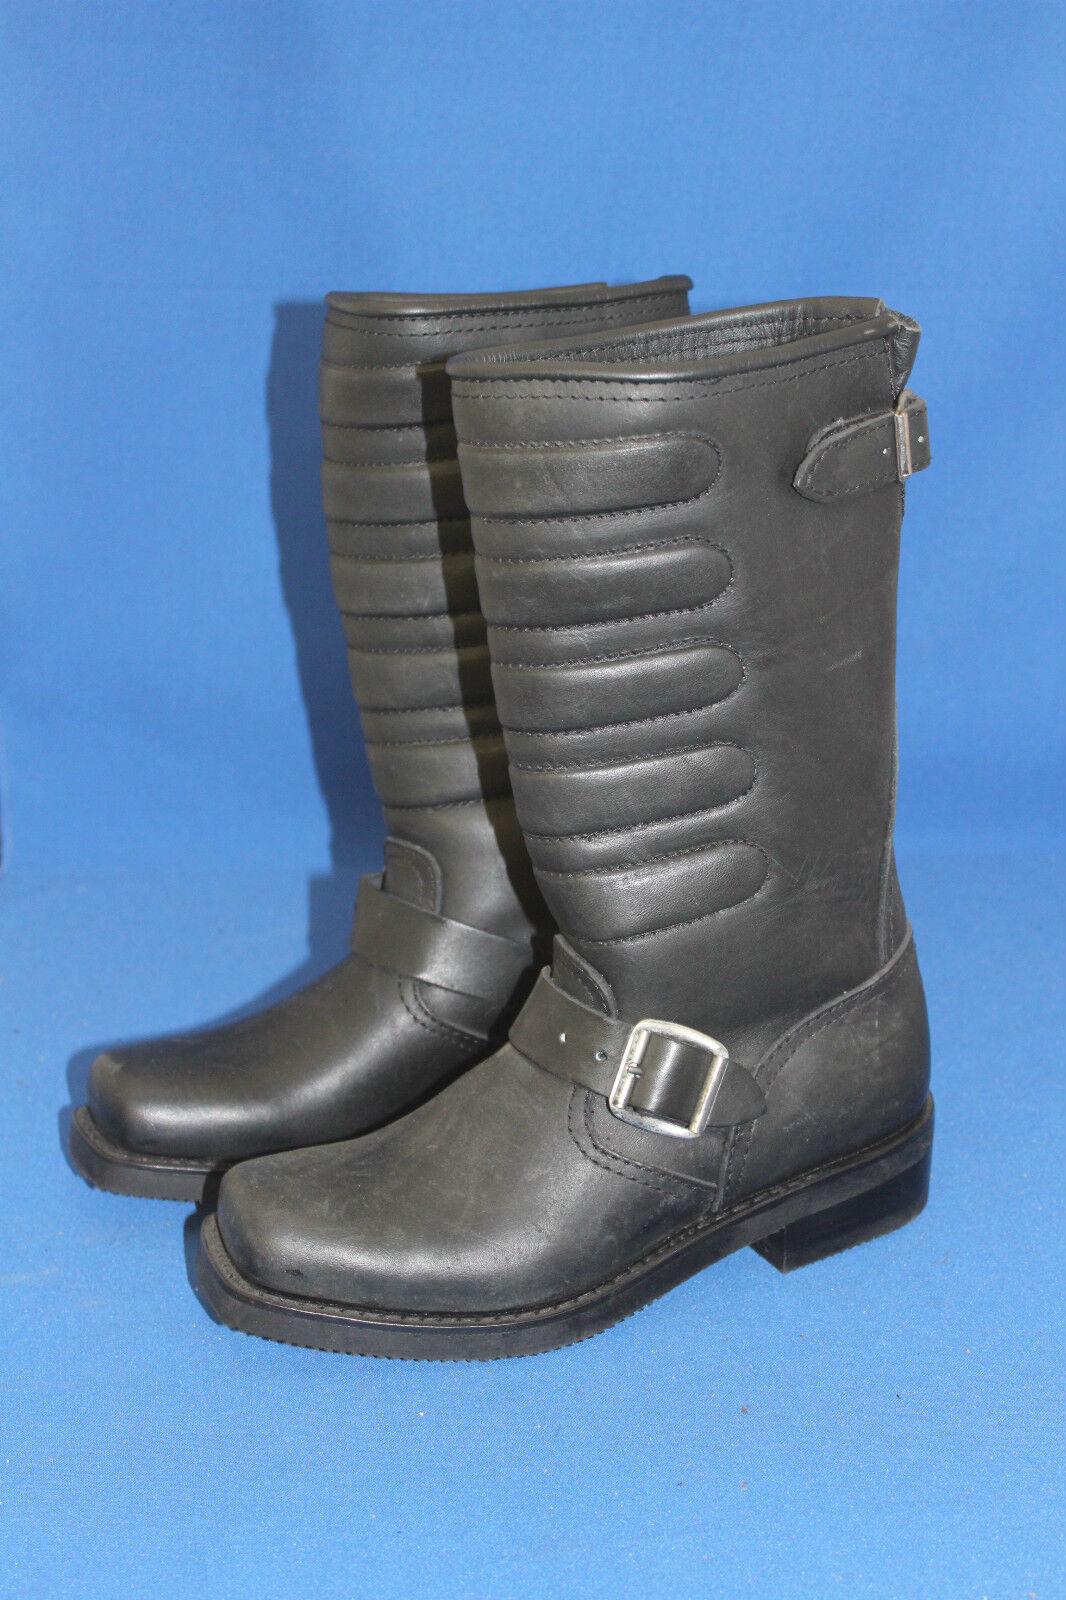 Sendra Stiefel  cowboystiefel westernstiefel Biker neu leder handmade  Stiefel gr. 37 schwarz fdab84